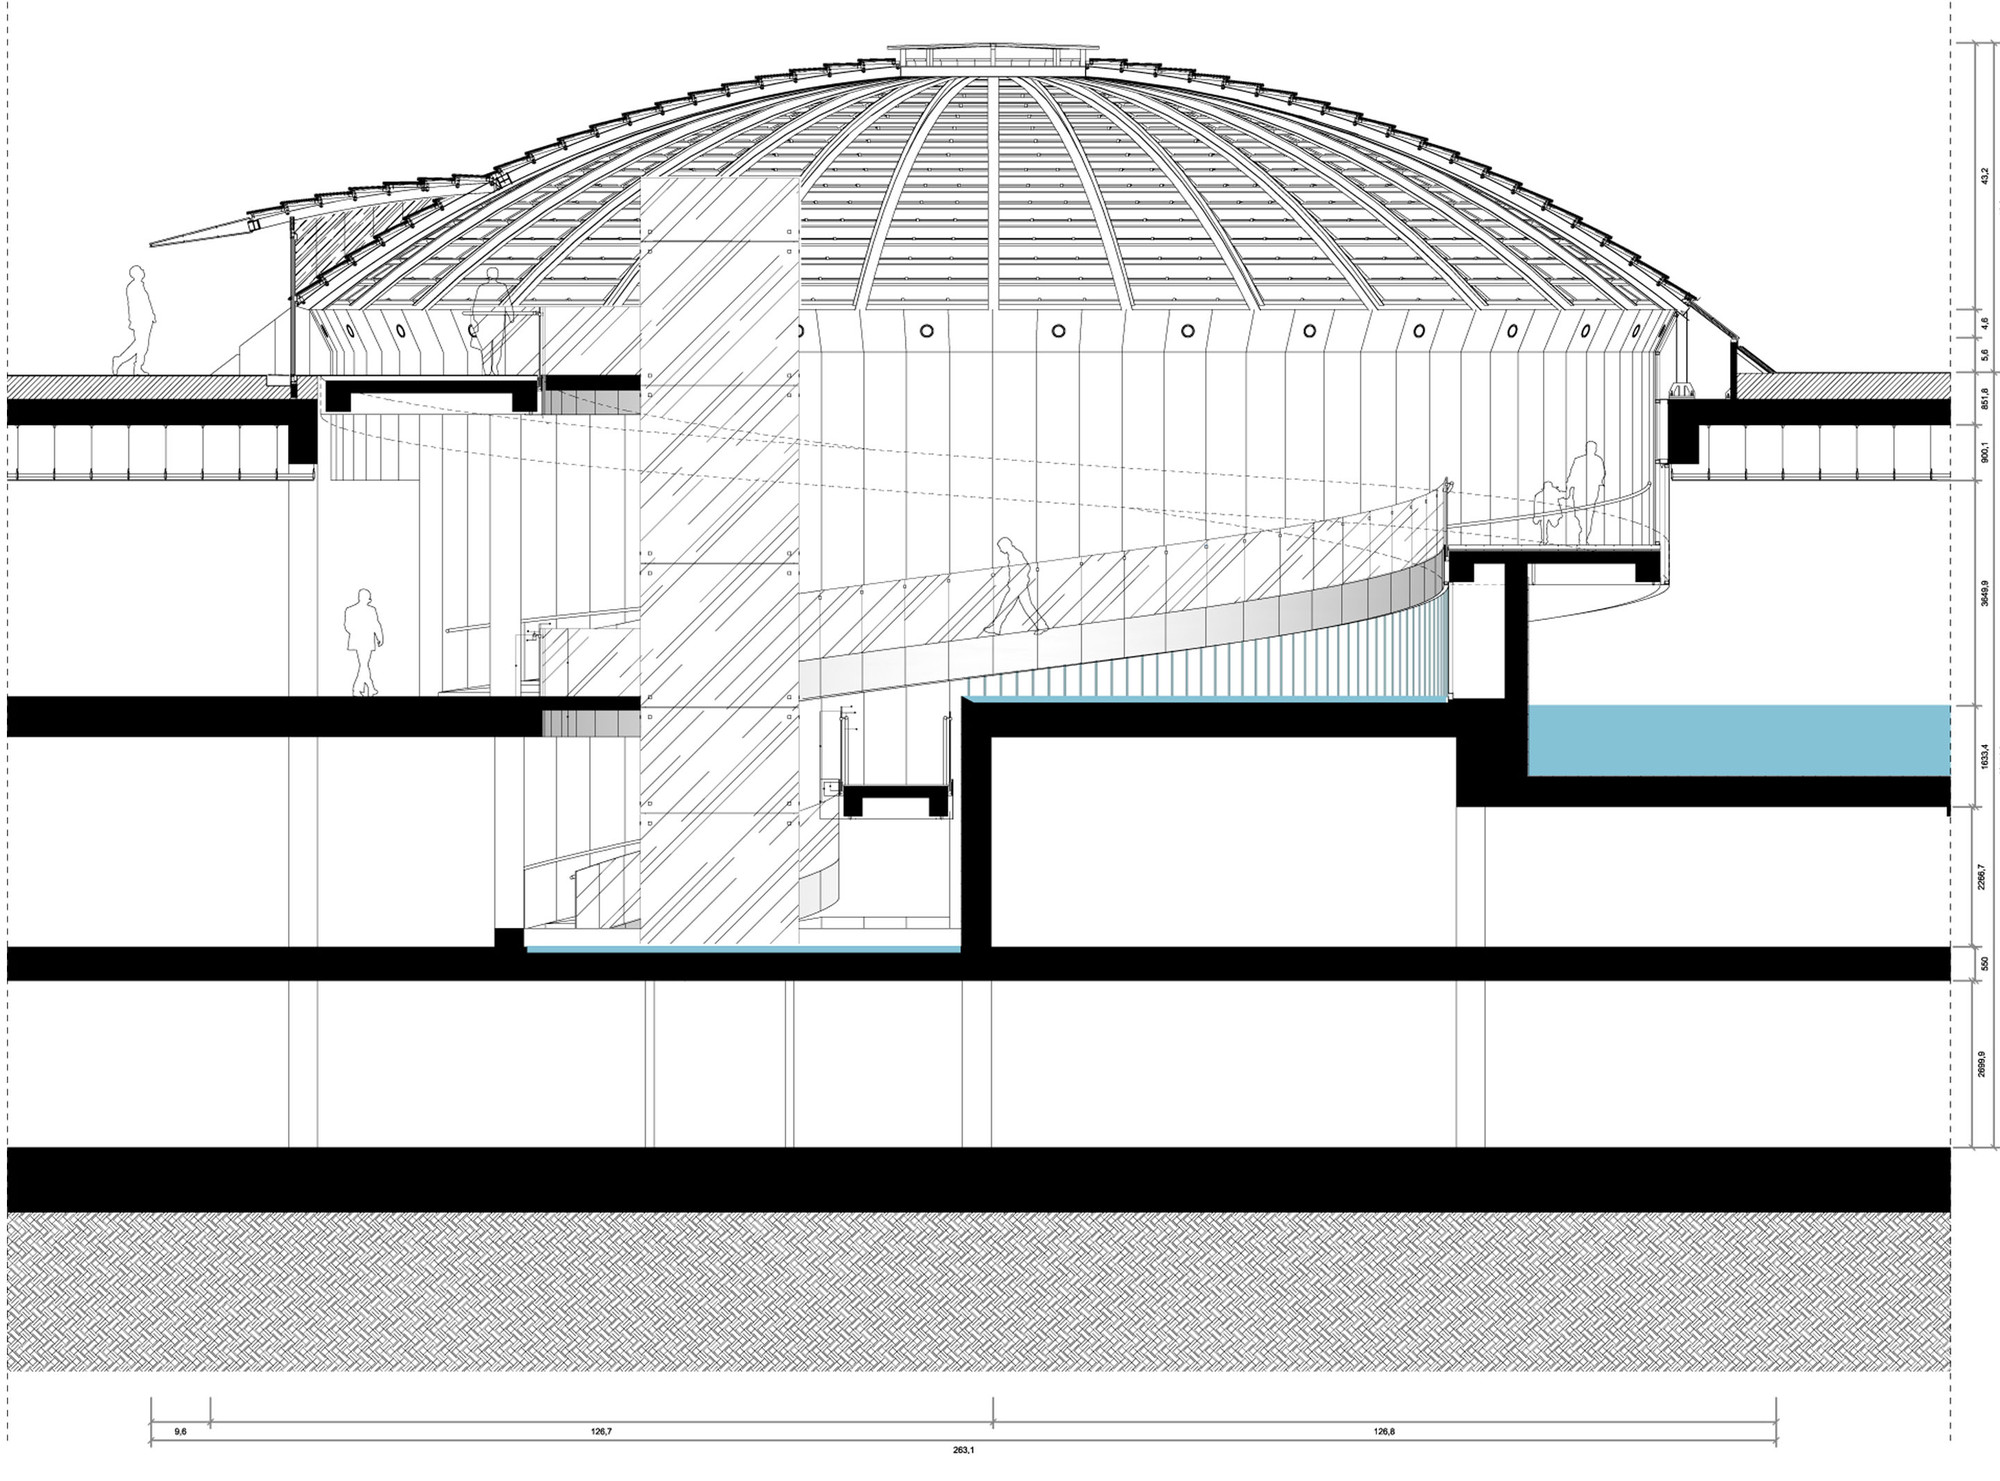 medium resolution of bagnoli futura section